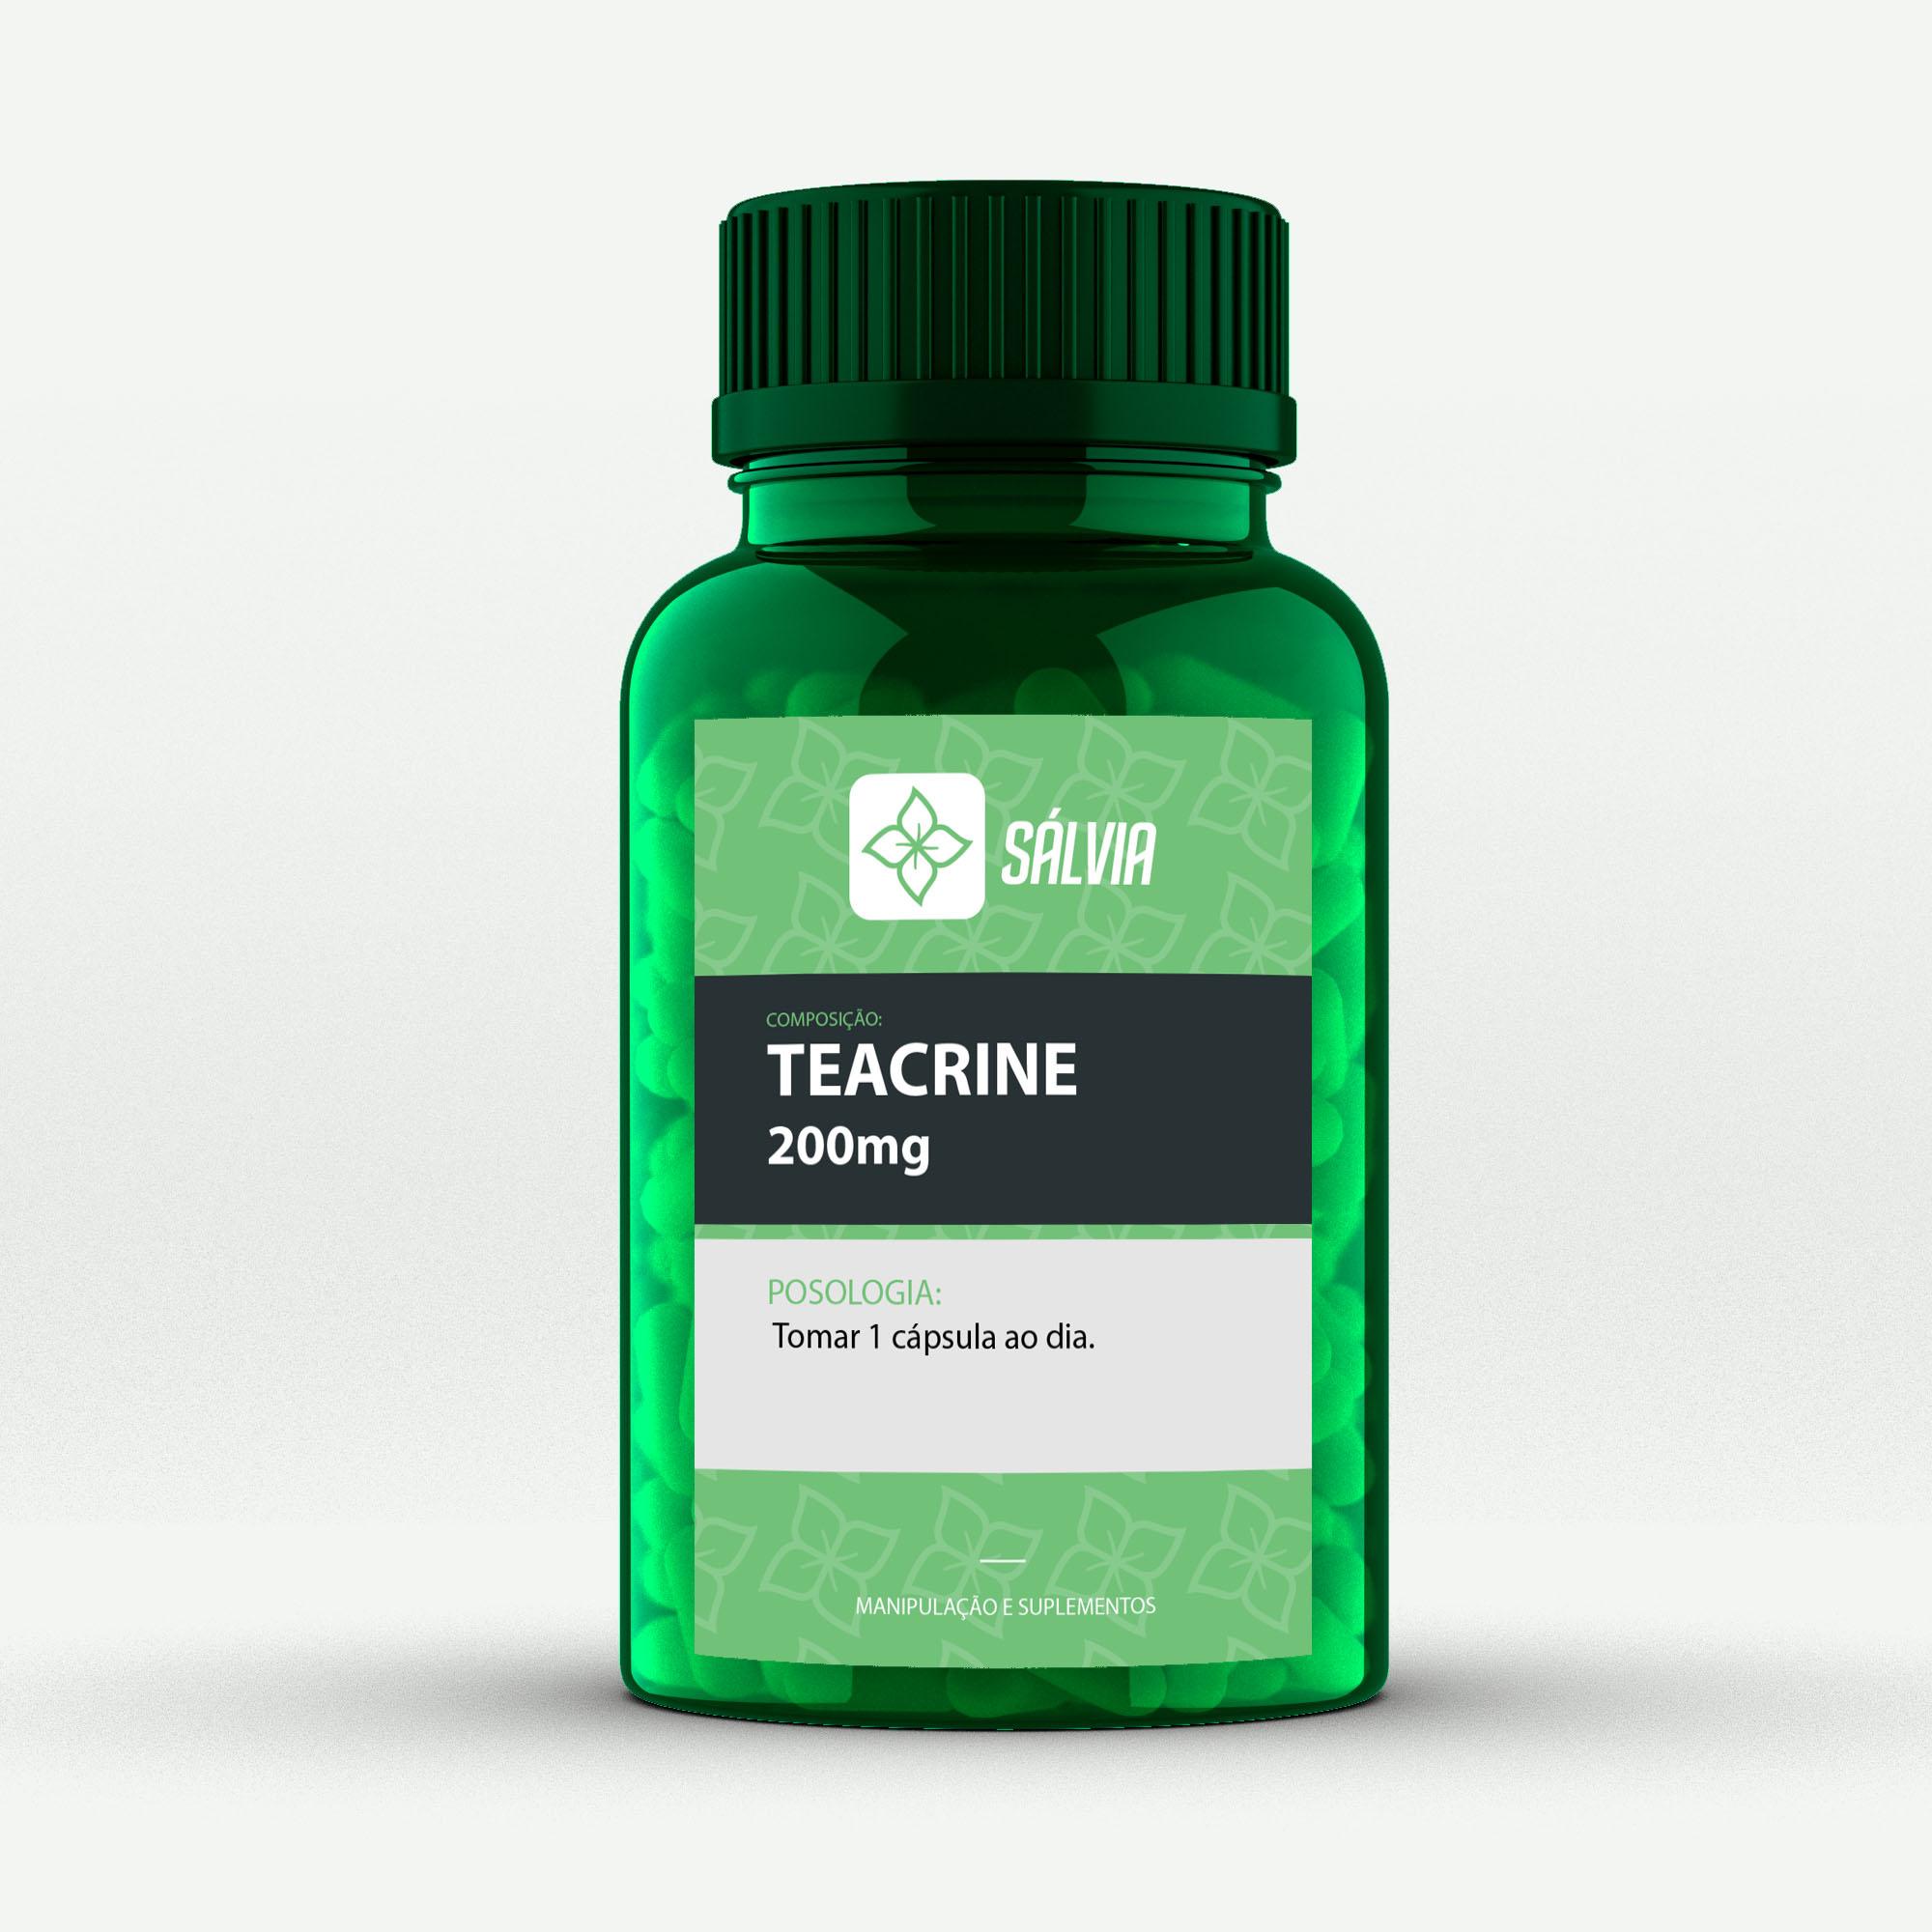 TEACRINE 200mg - Cápsulas